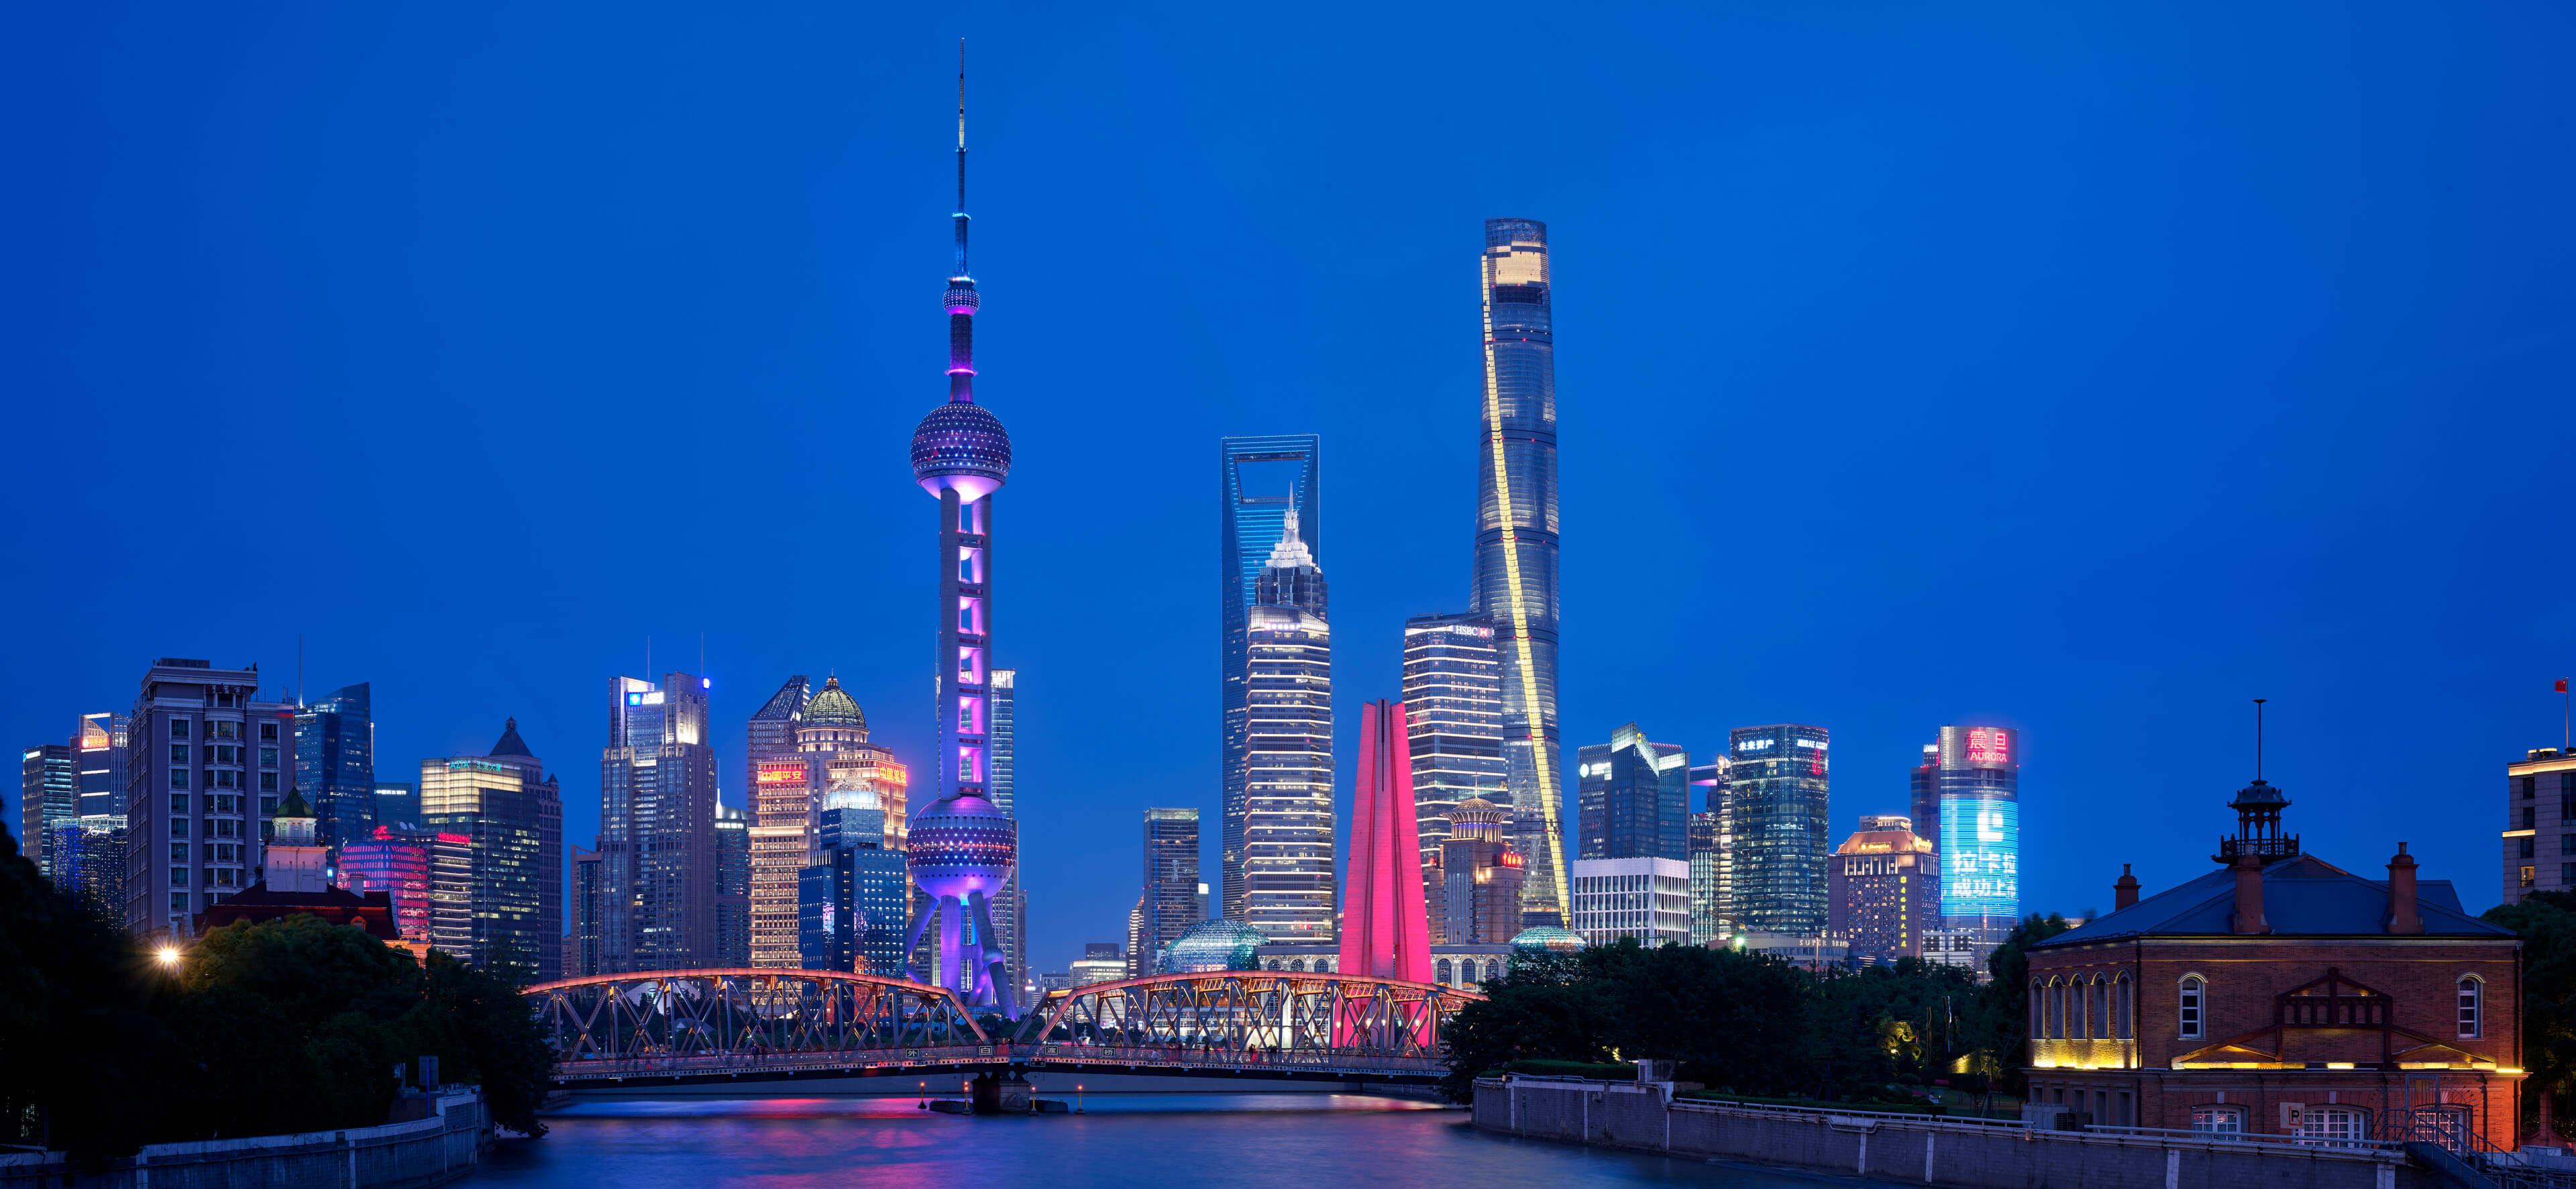 Liu Daoming Temperature of the City